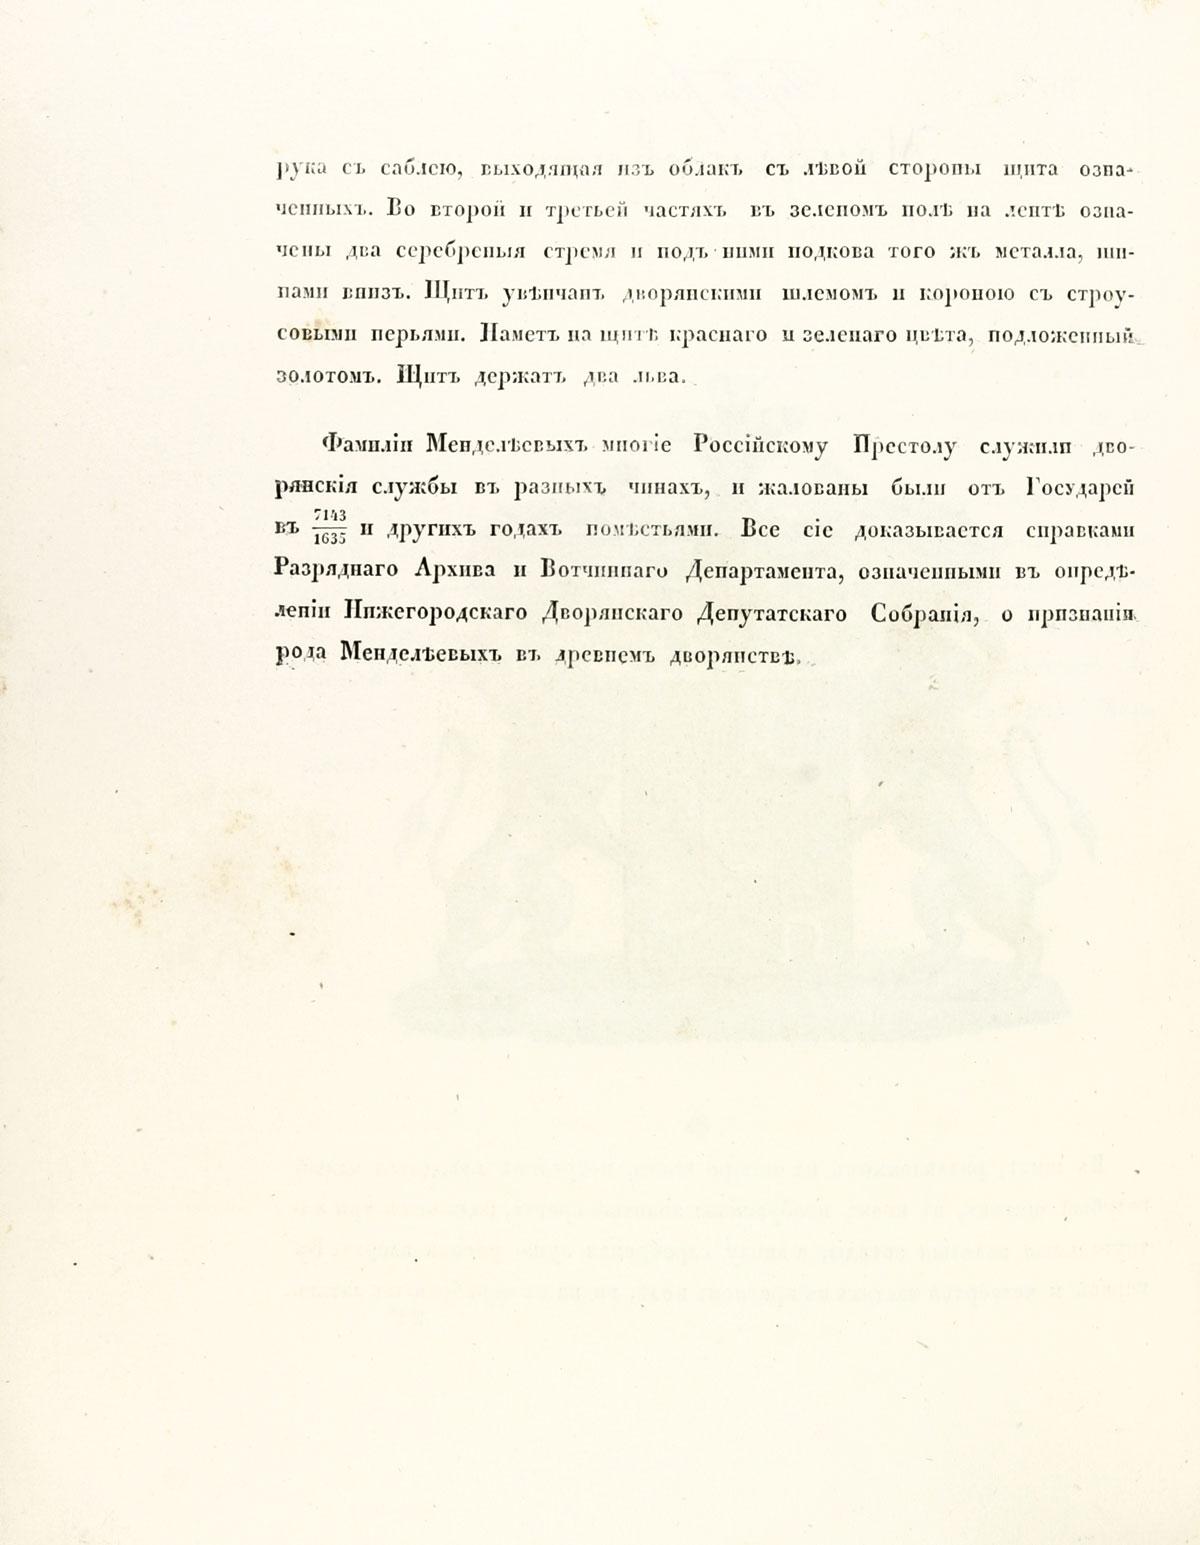 Герб рода Менделеевых, стр. 2